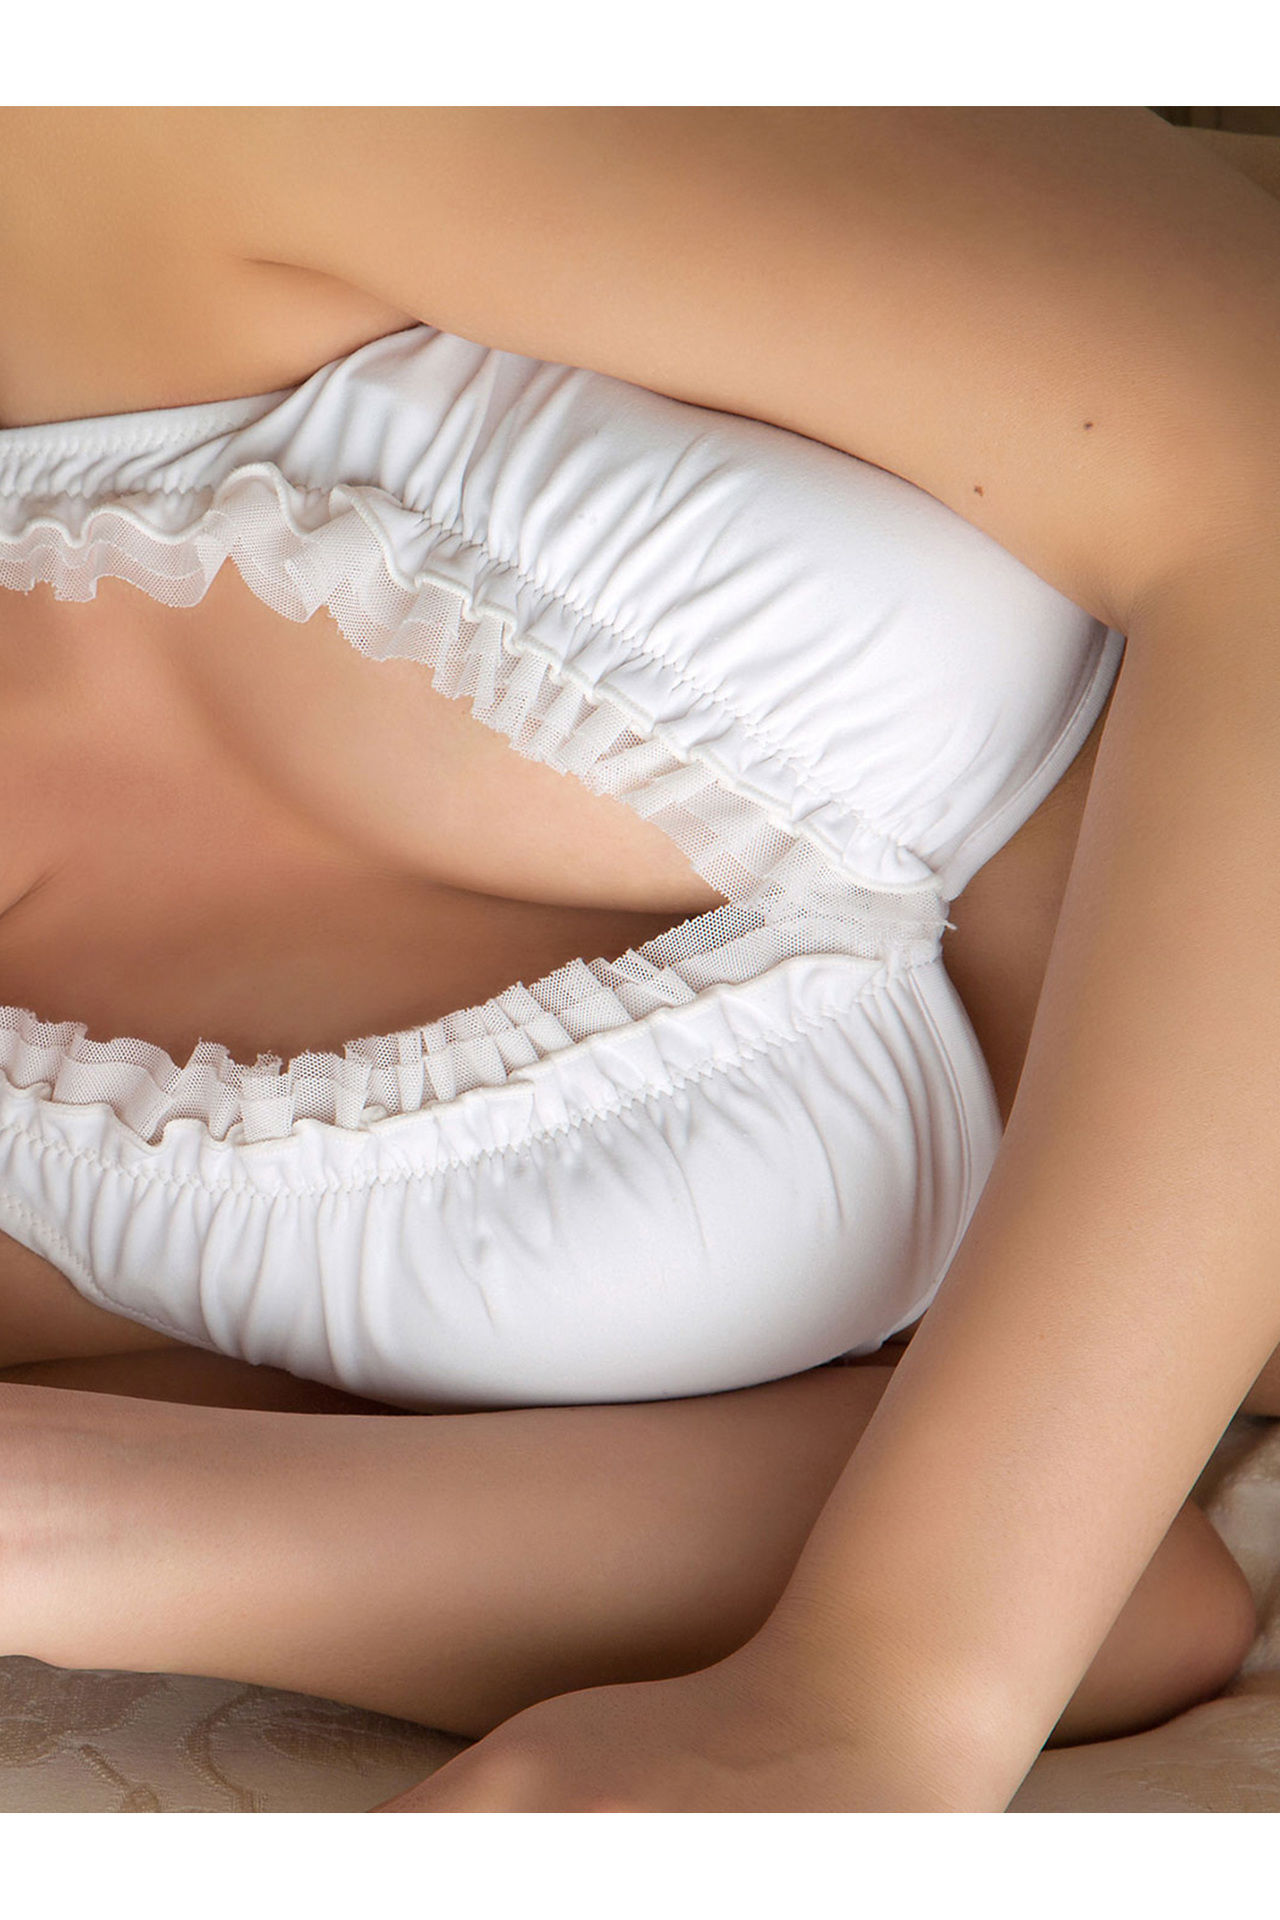 Onuki Ayaka Onuki takes off her school uniform and wears a white bikini035